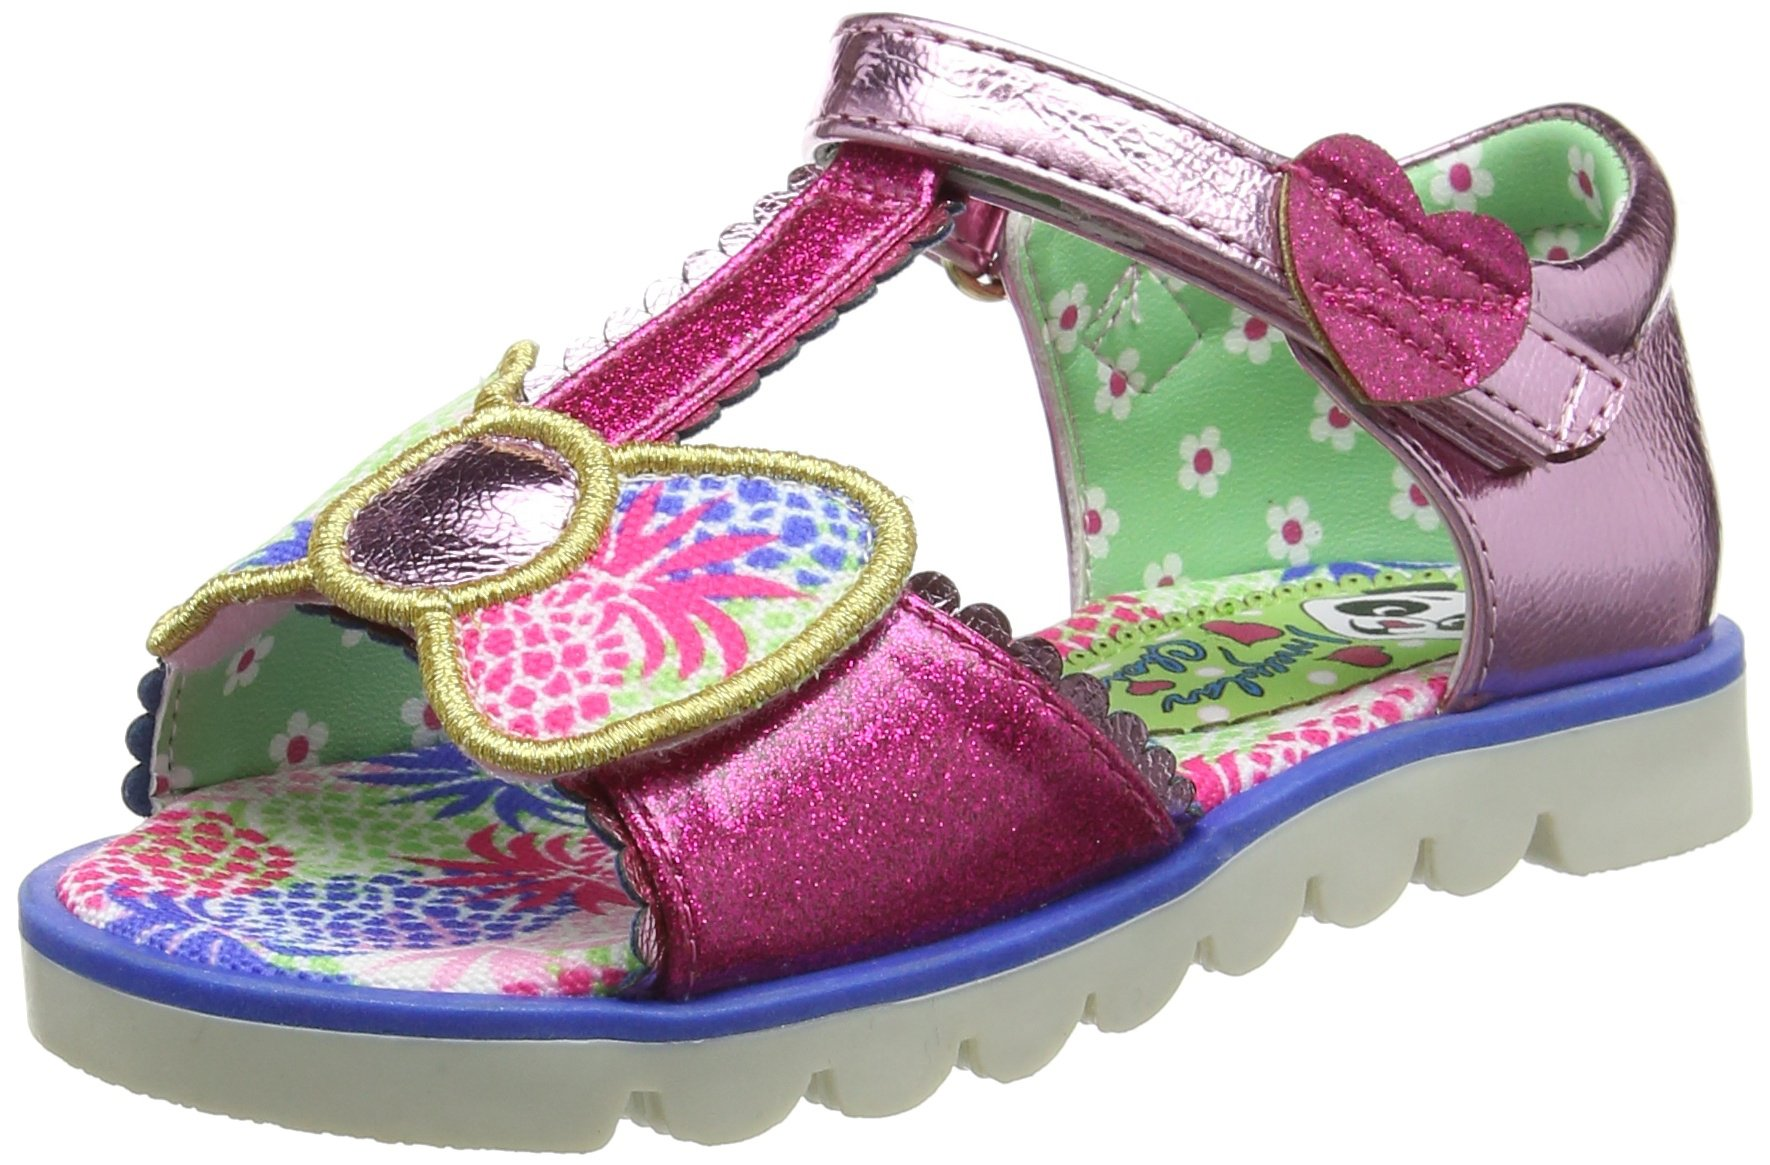 Irregular Choice Girl's Kids Baby Bow Bell Pink Open Toe Sandal Childrens Shoe Pink Uk 2.5 - Eu 35 - Us 3.5